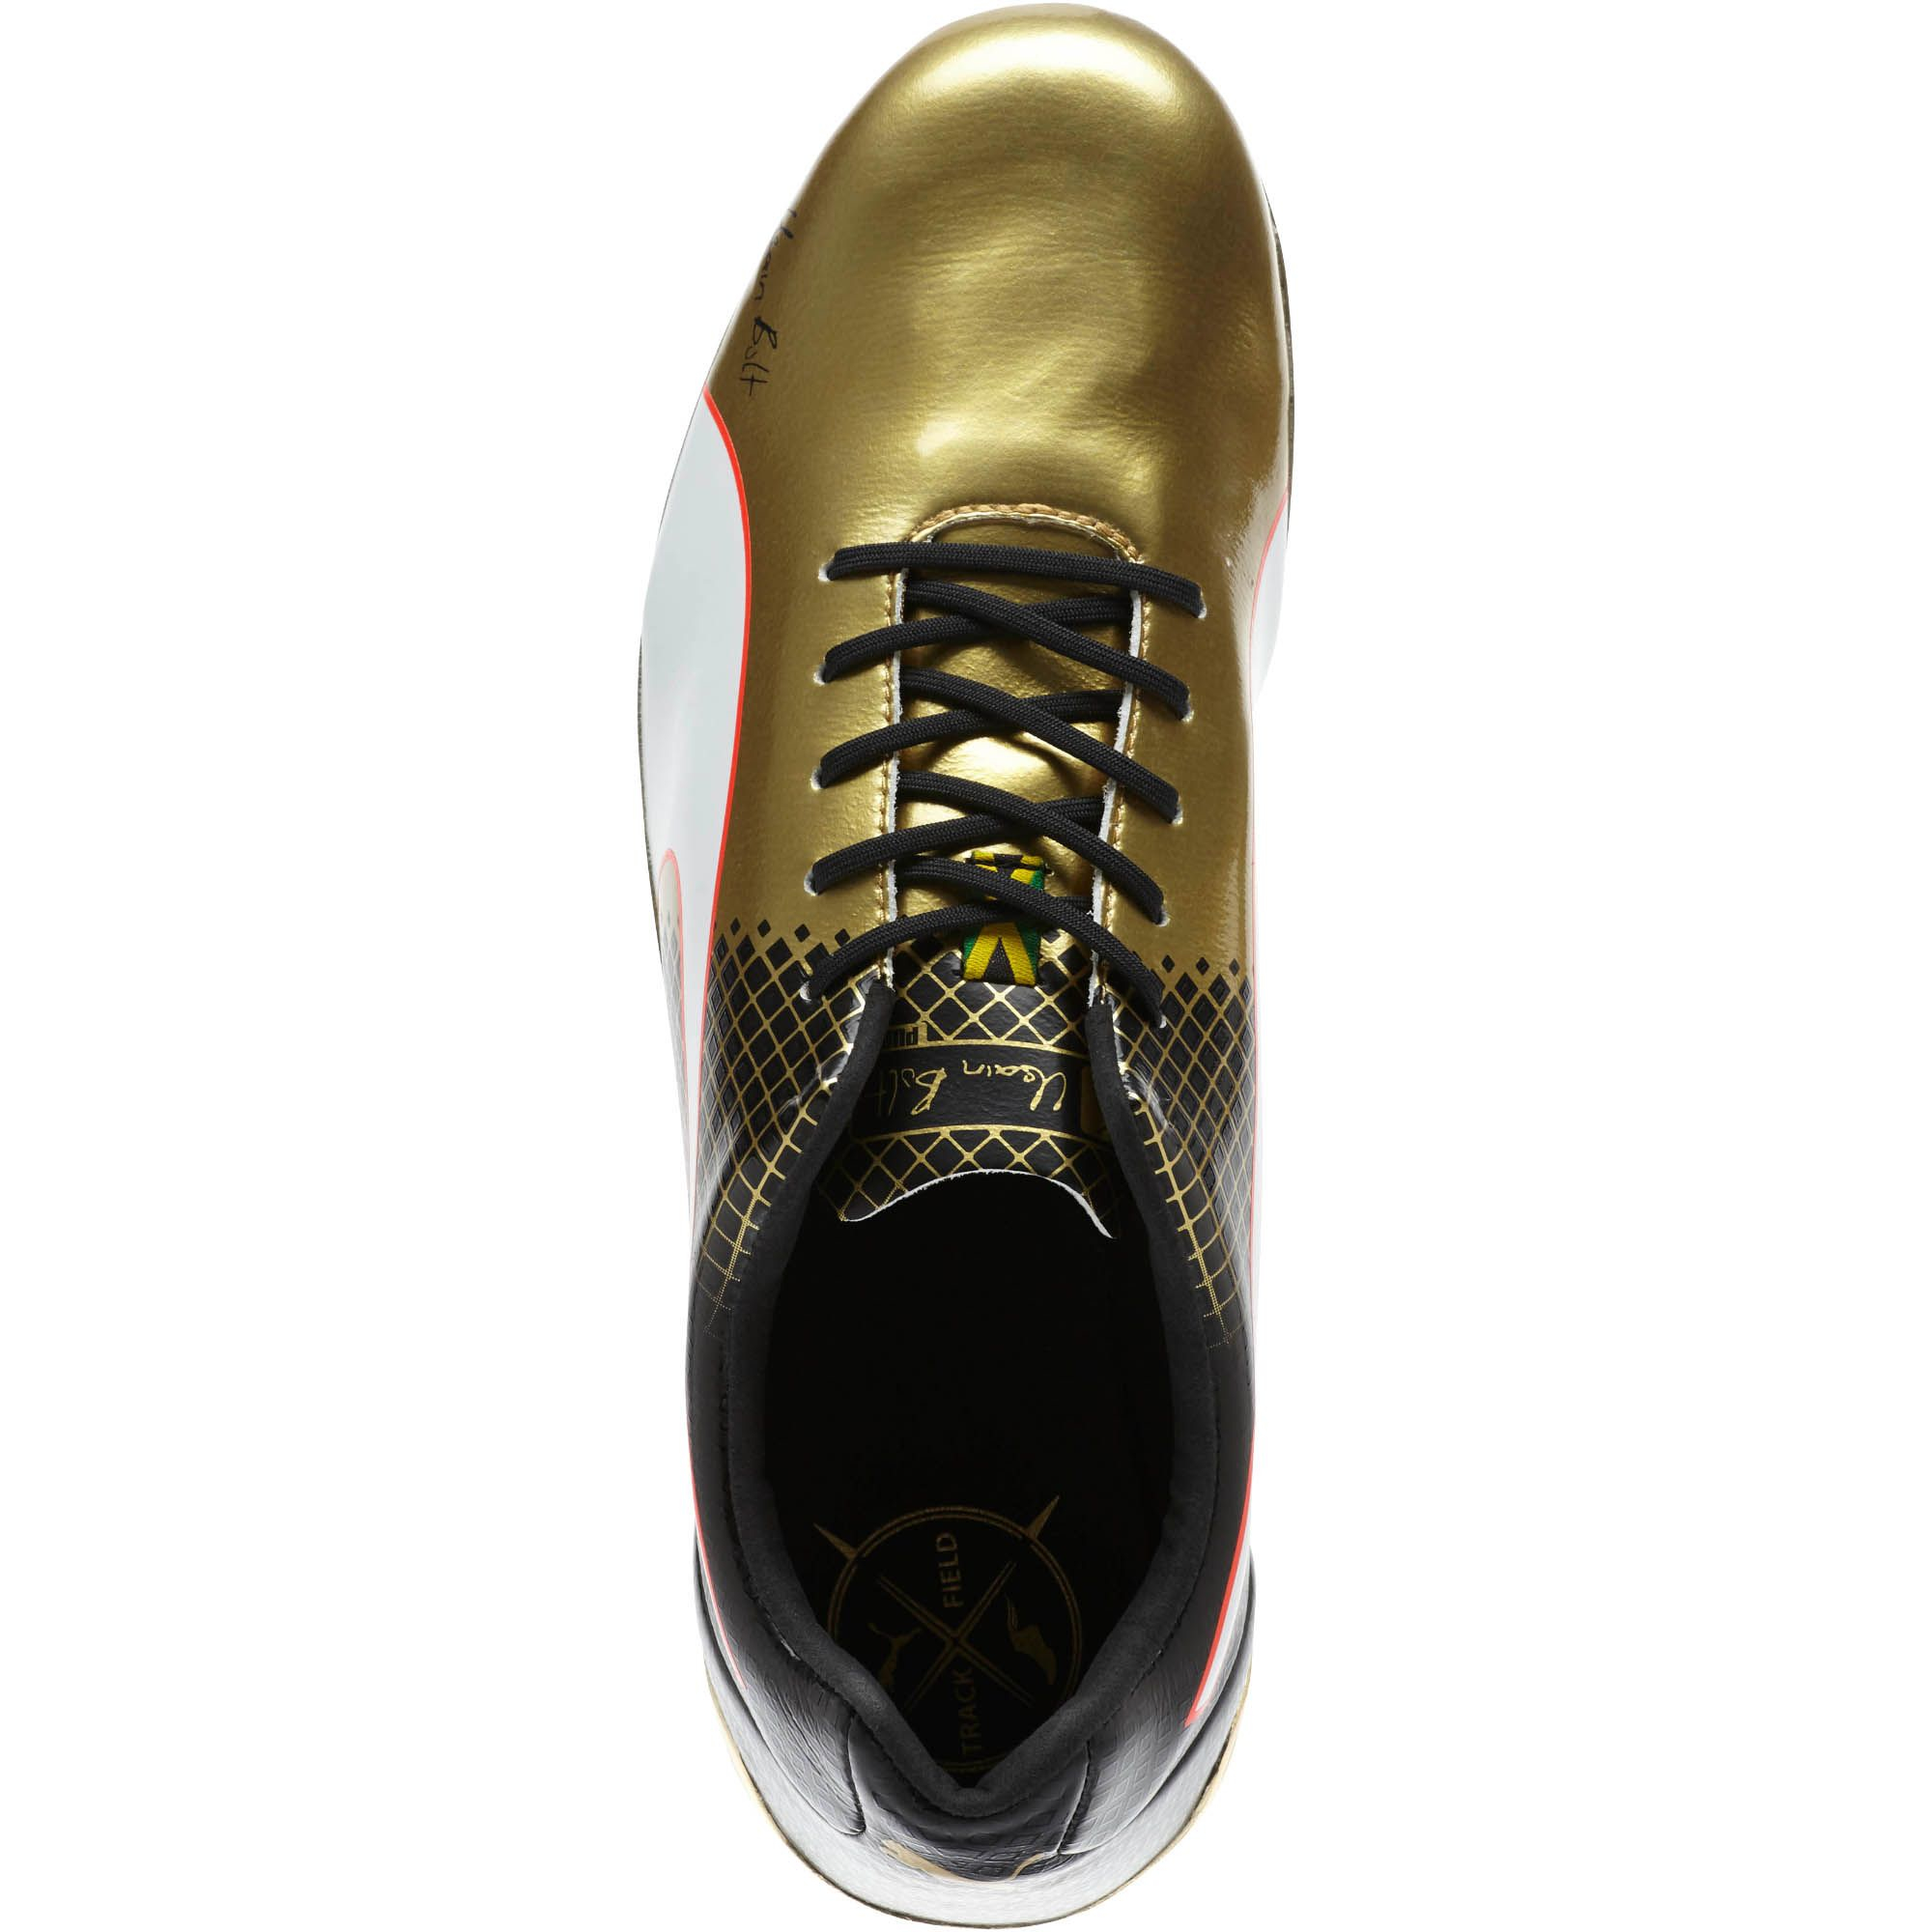 Lyst - PUMA Evospeed Electric Bolt Tricks Men s Sprint Track Spikes ... 06cf6f7bf